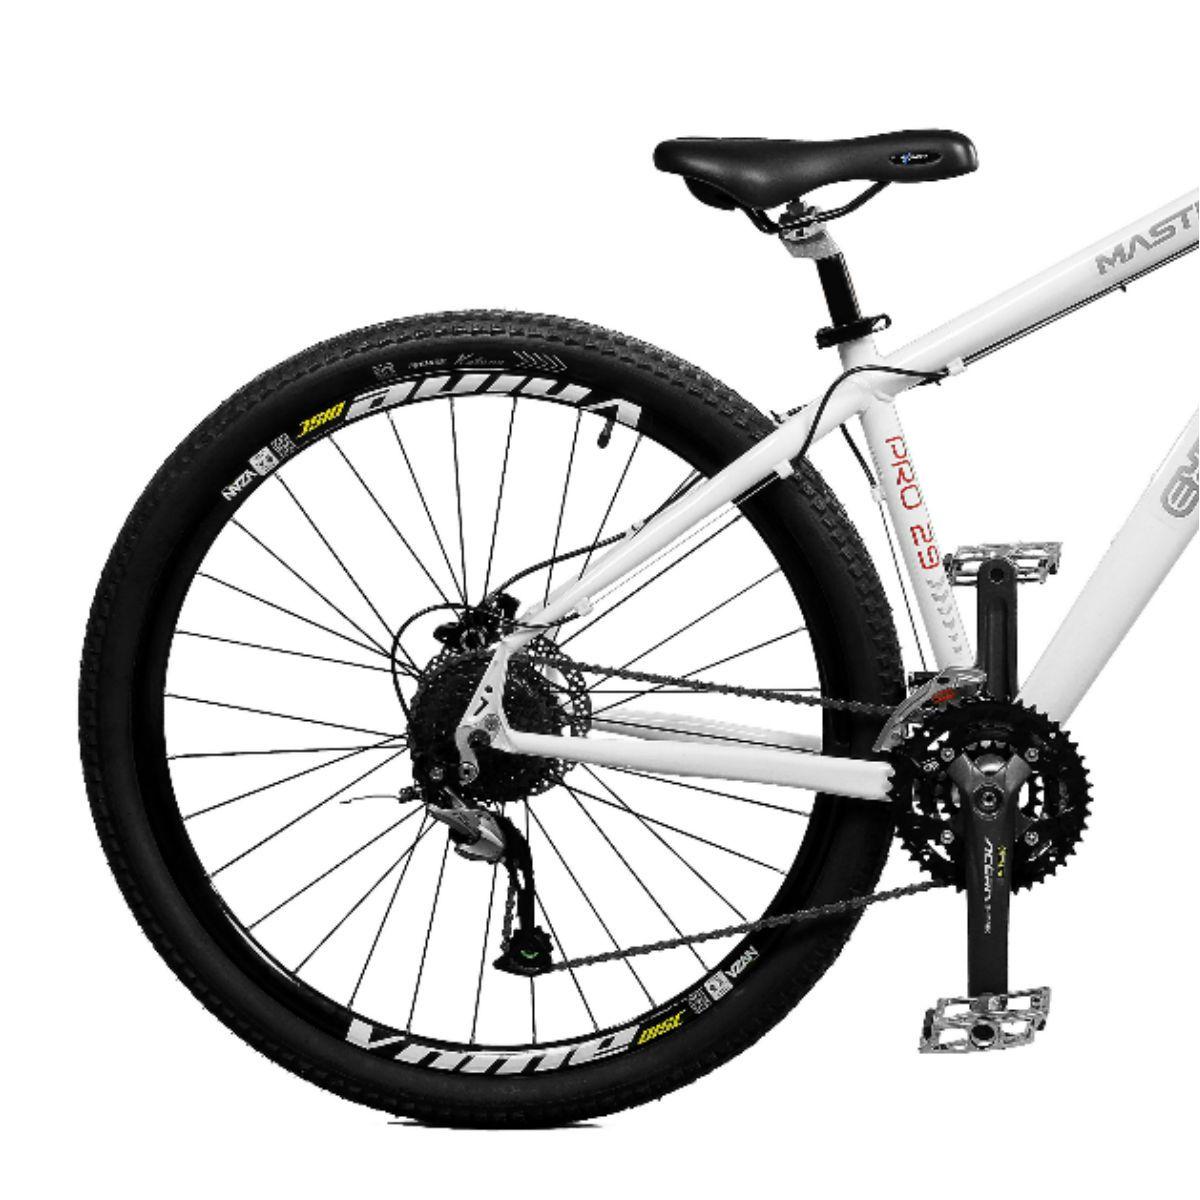 Bicicleta Master Bike Aro 29 Extreme Pro Freio Hidráulico 27 V Branco